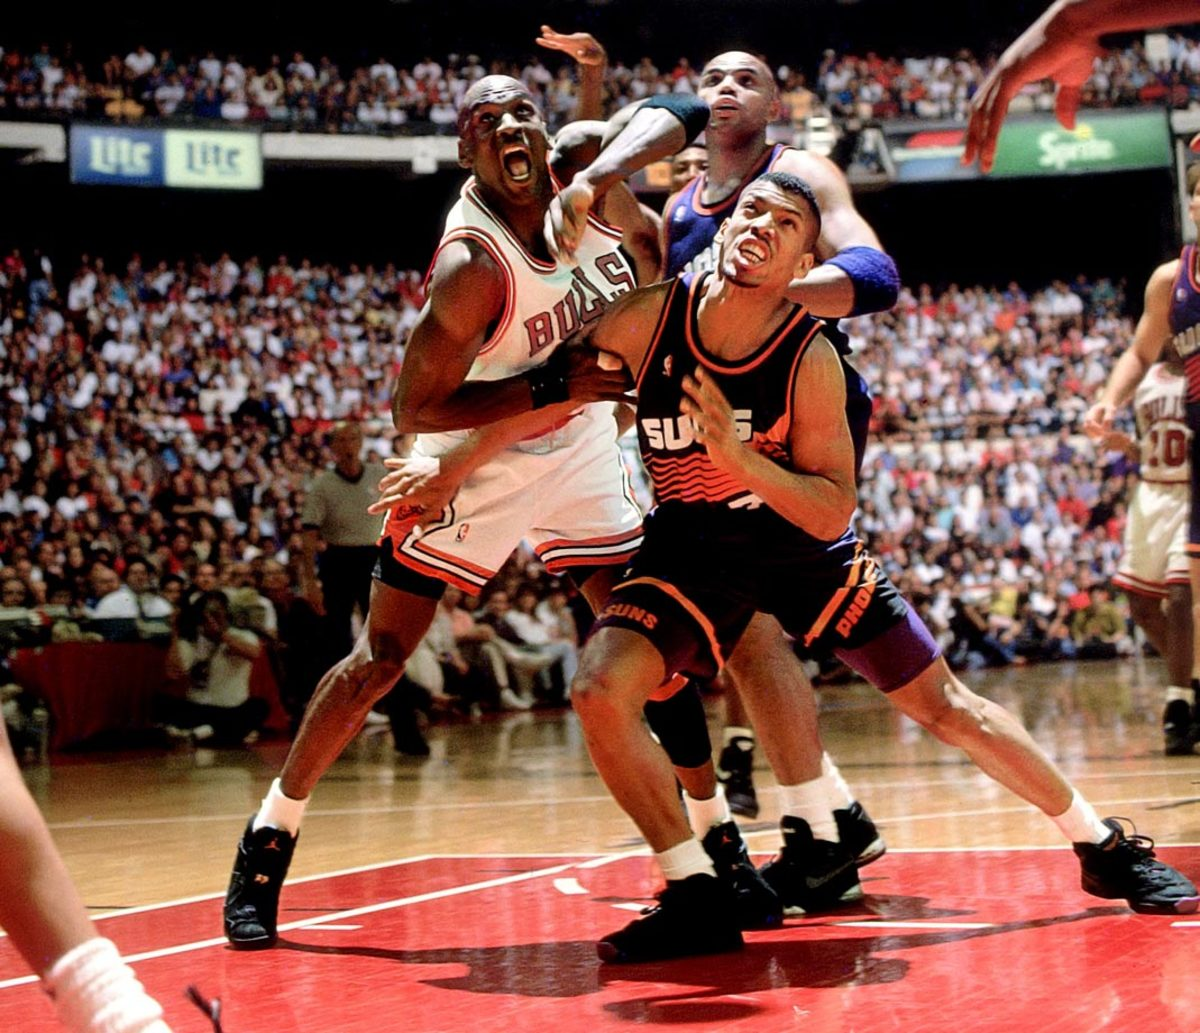 1993-Michael-Jordan-Kevin-Johnson-Charles-Barkley-005102070.jpg